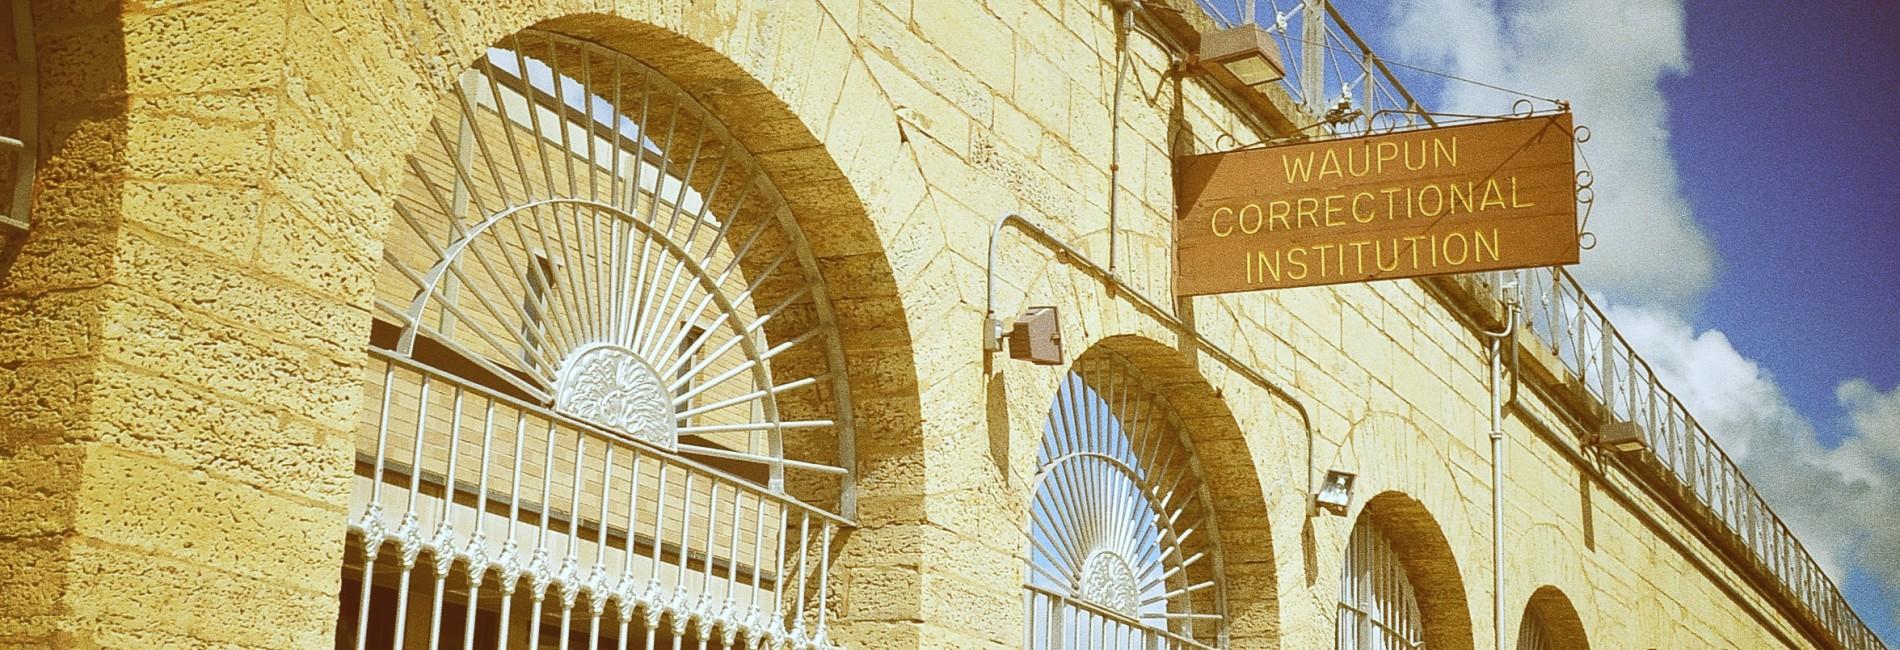 Waupun Correctional Institution